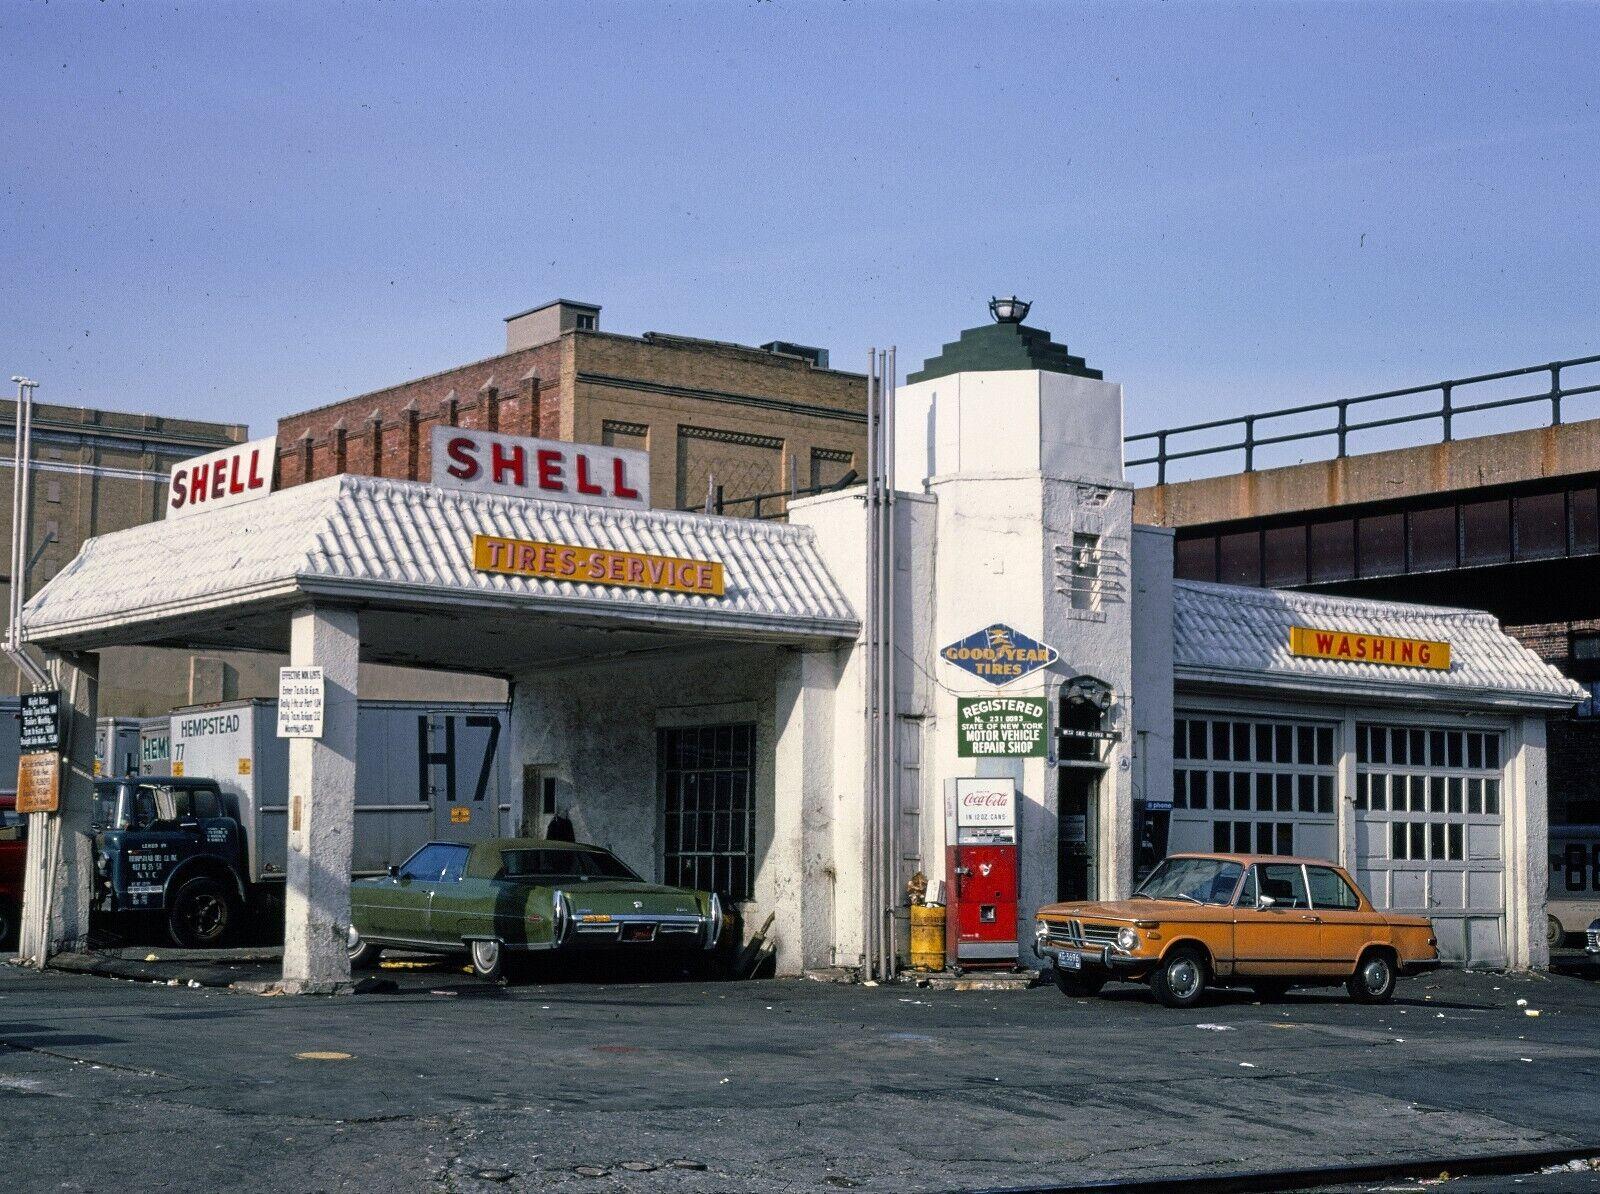 Image 01 - Shell Gas Station New York City NY 8.5x11 Color B&W Photo Print